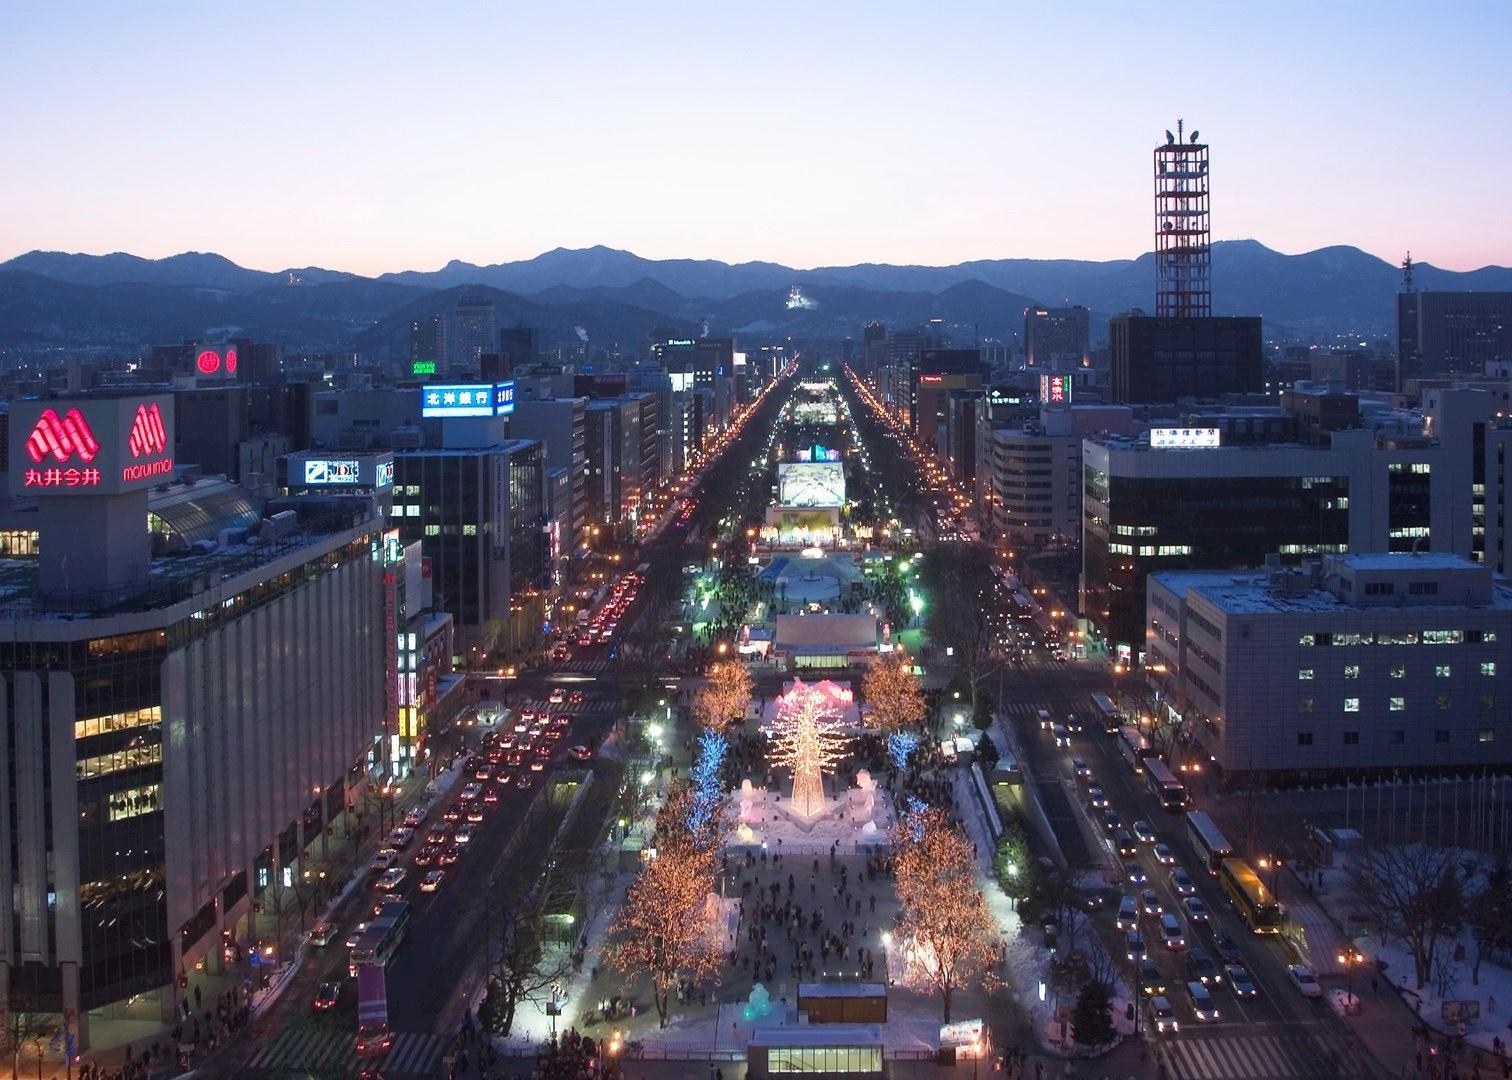 Best Hotels Near Sapporo Snow Festival, Japan - TripAdvisor